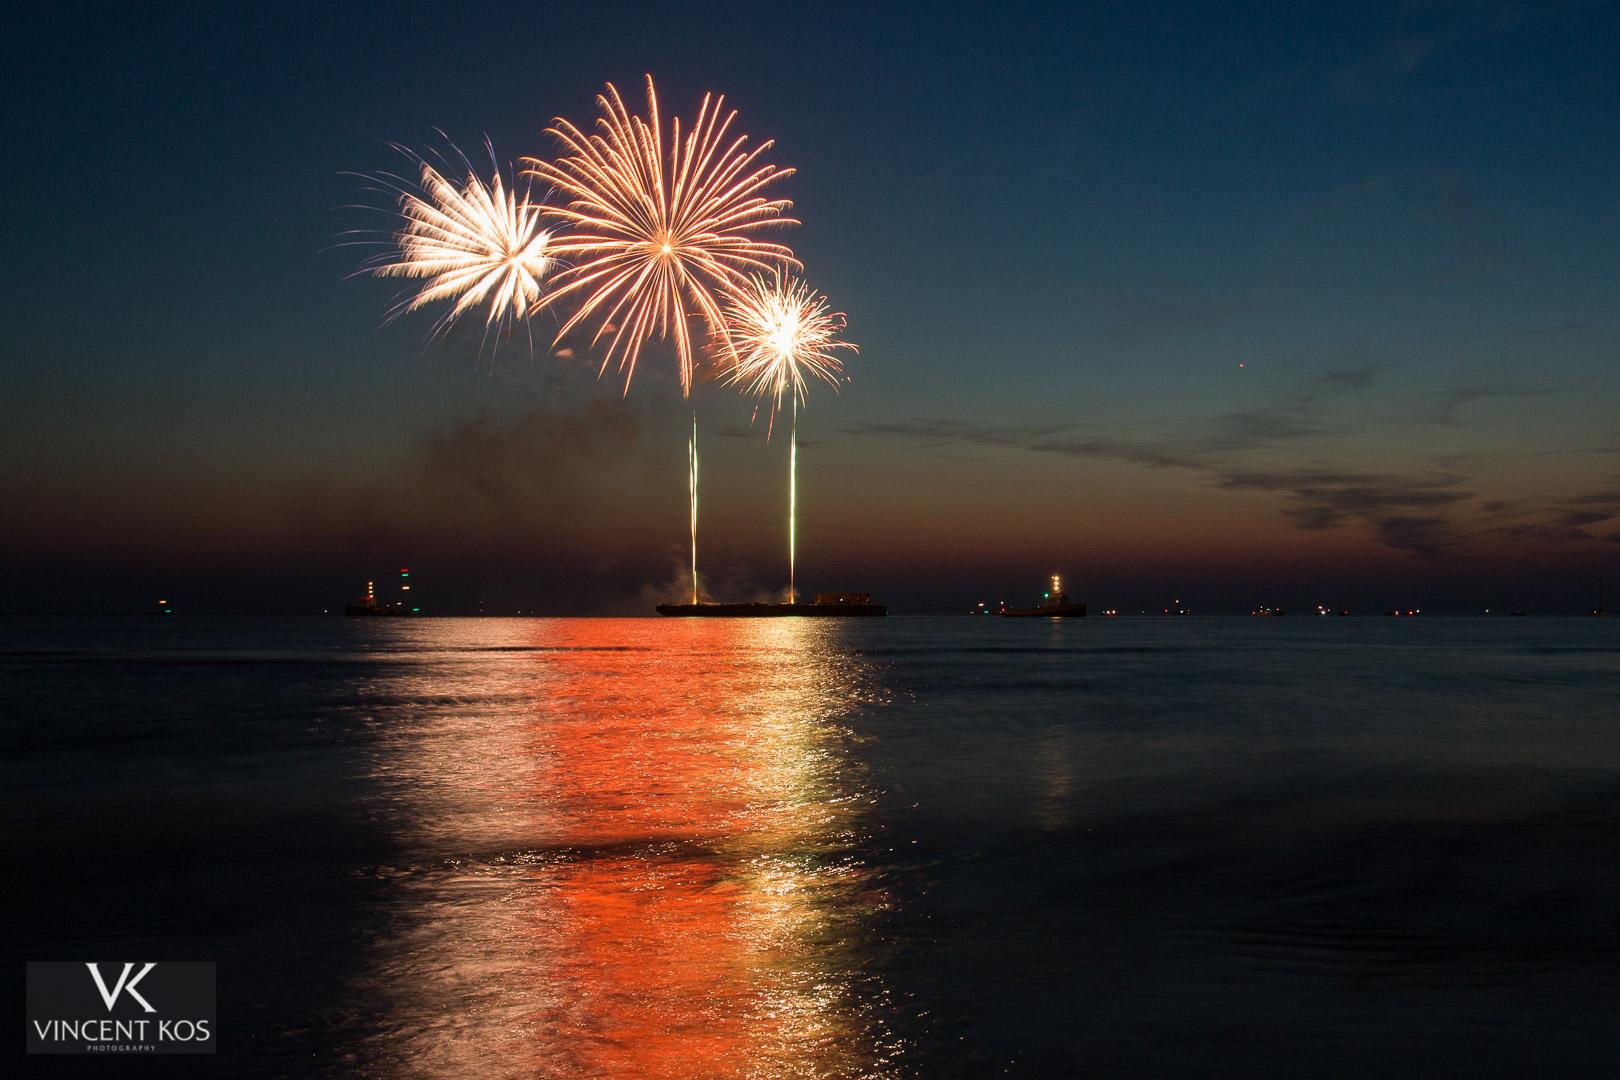 1_Vuurwerkfestival_Scheveningen_Vincent_Kos-